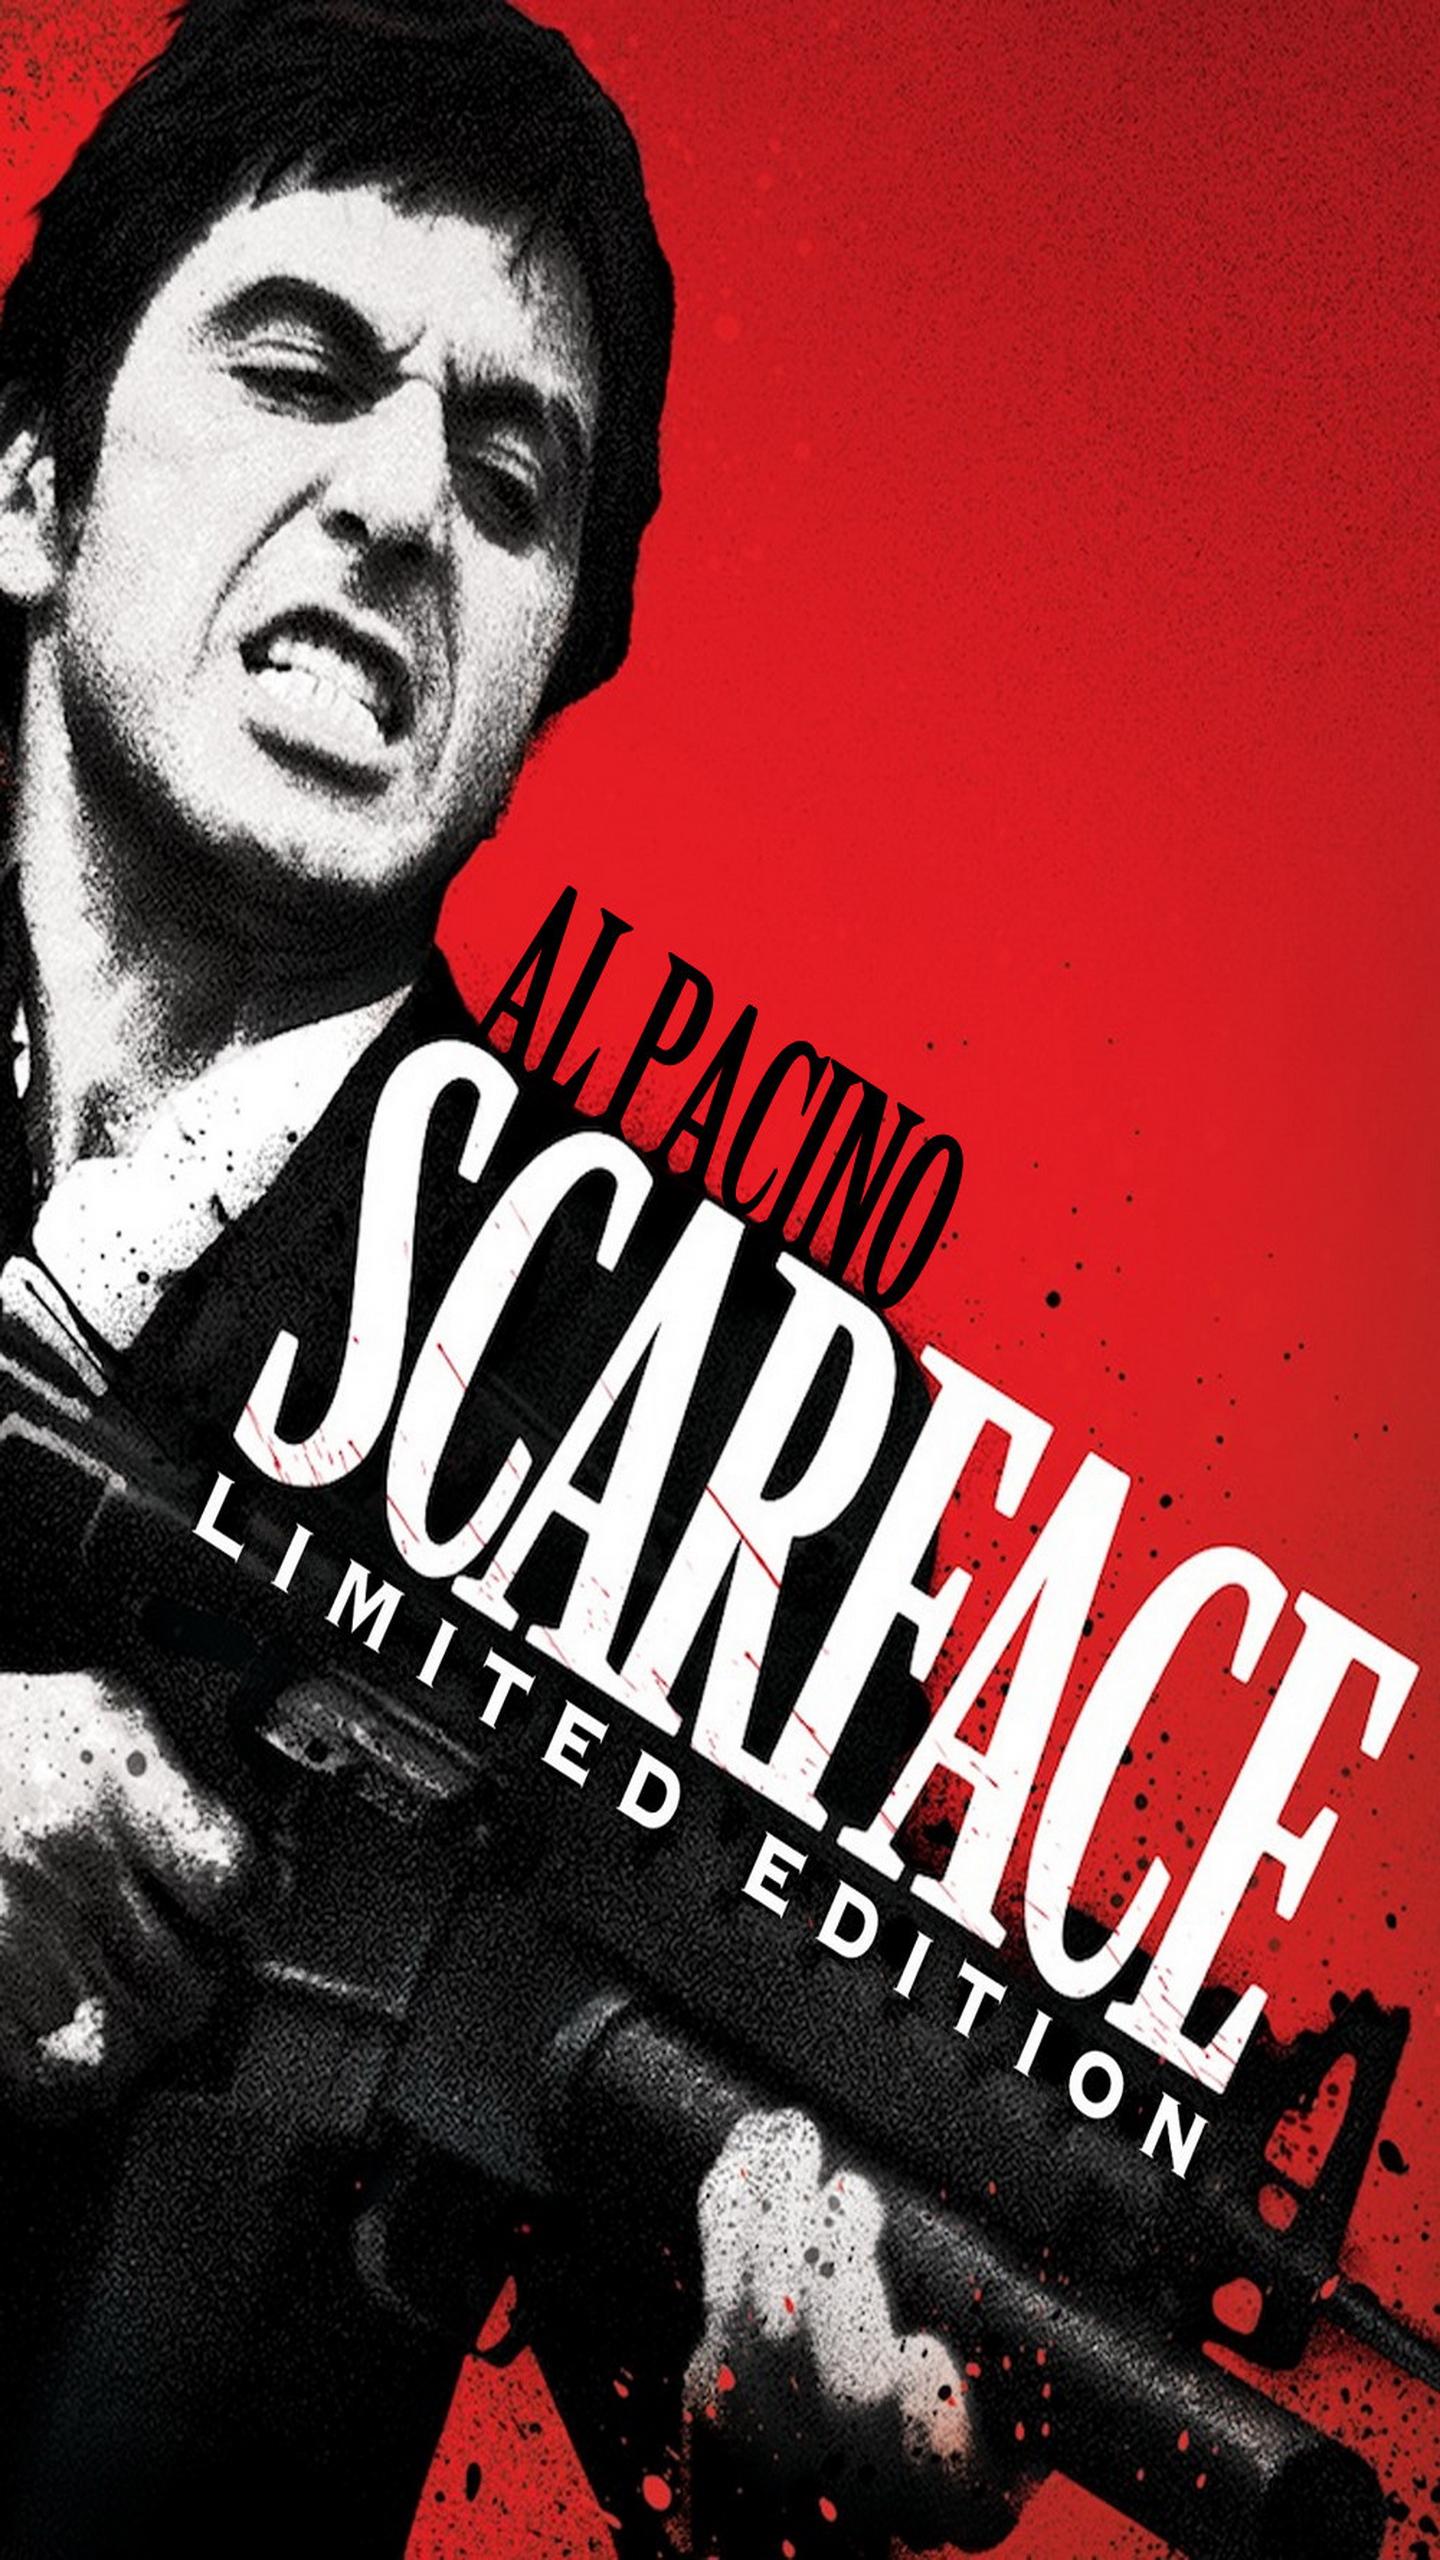 Scarface tropical wallpaper wallpapersafari - Scarface background ...